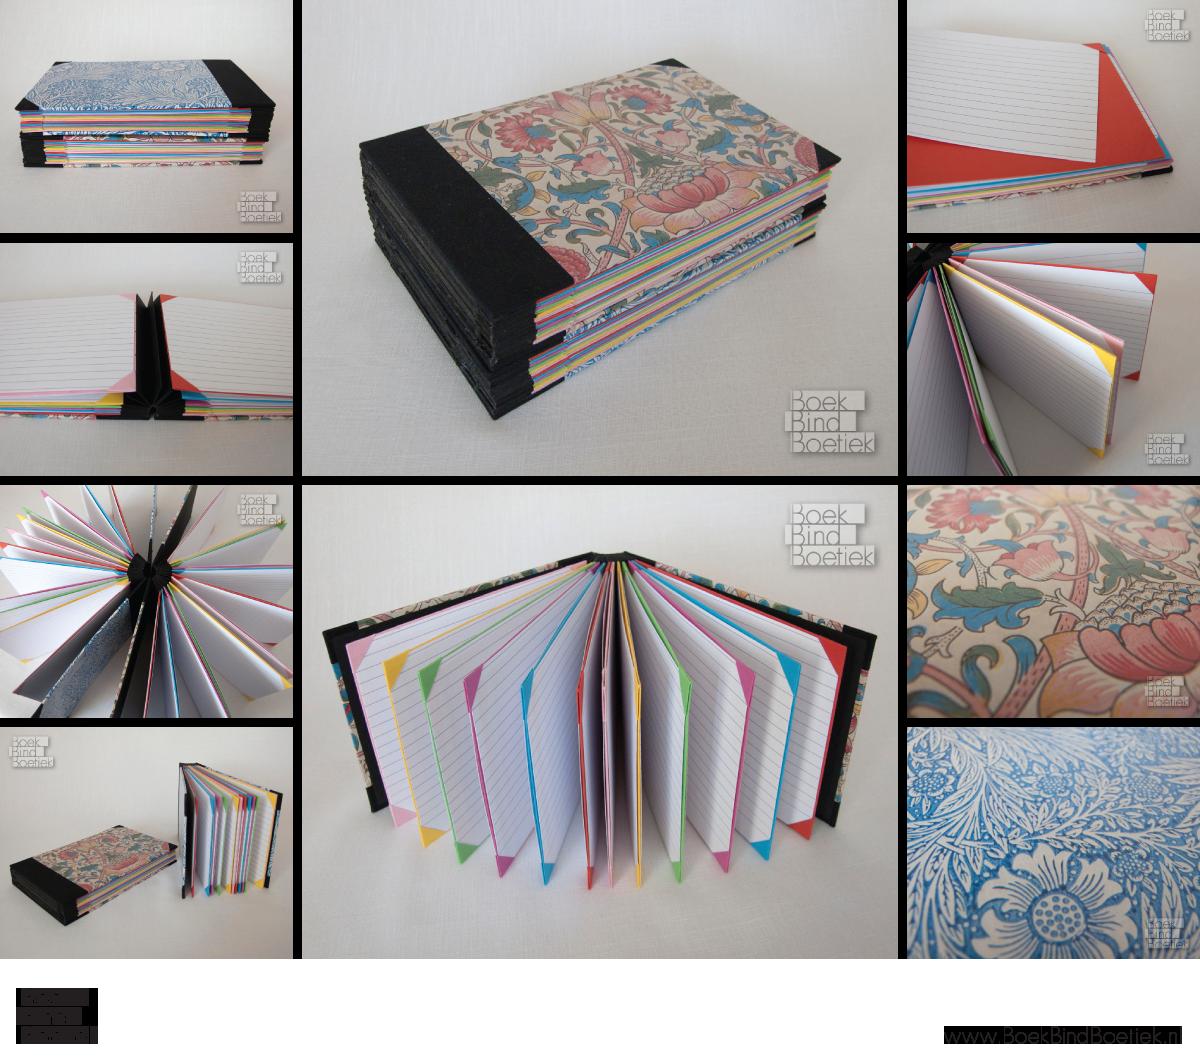 index card recipe books by boekbindboetiek on deviantart